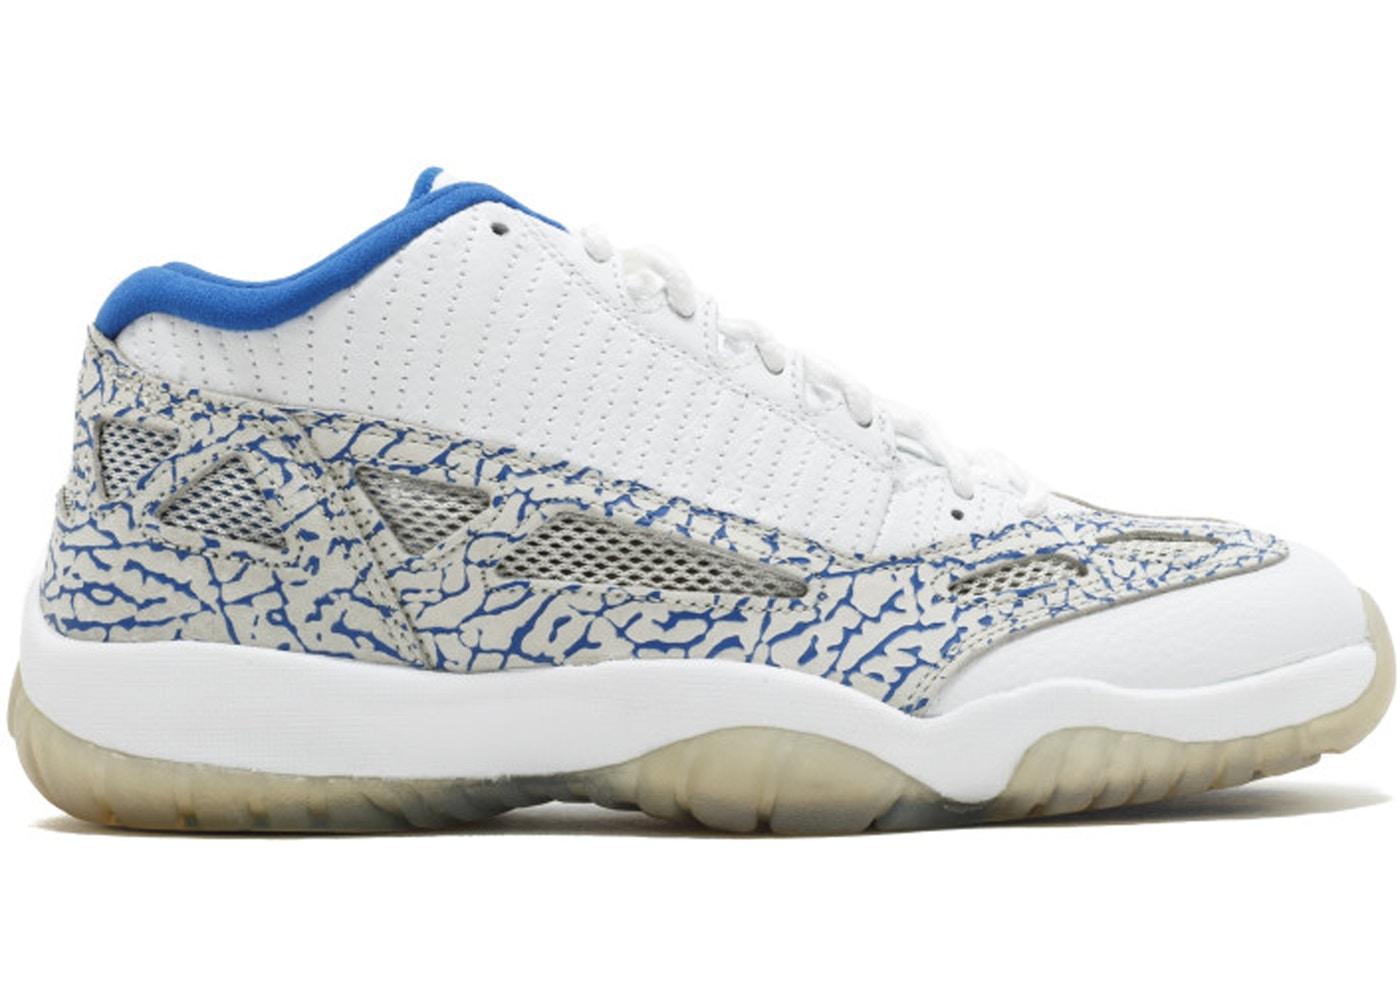 Jordan 11 Retro Low Ie White Argon Blue 306008 172